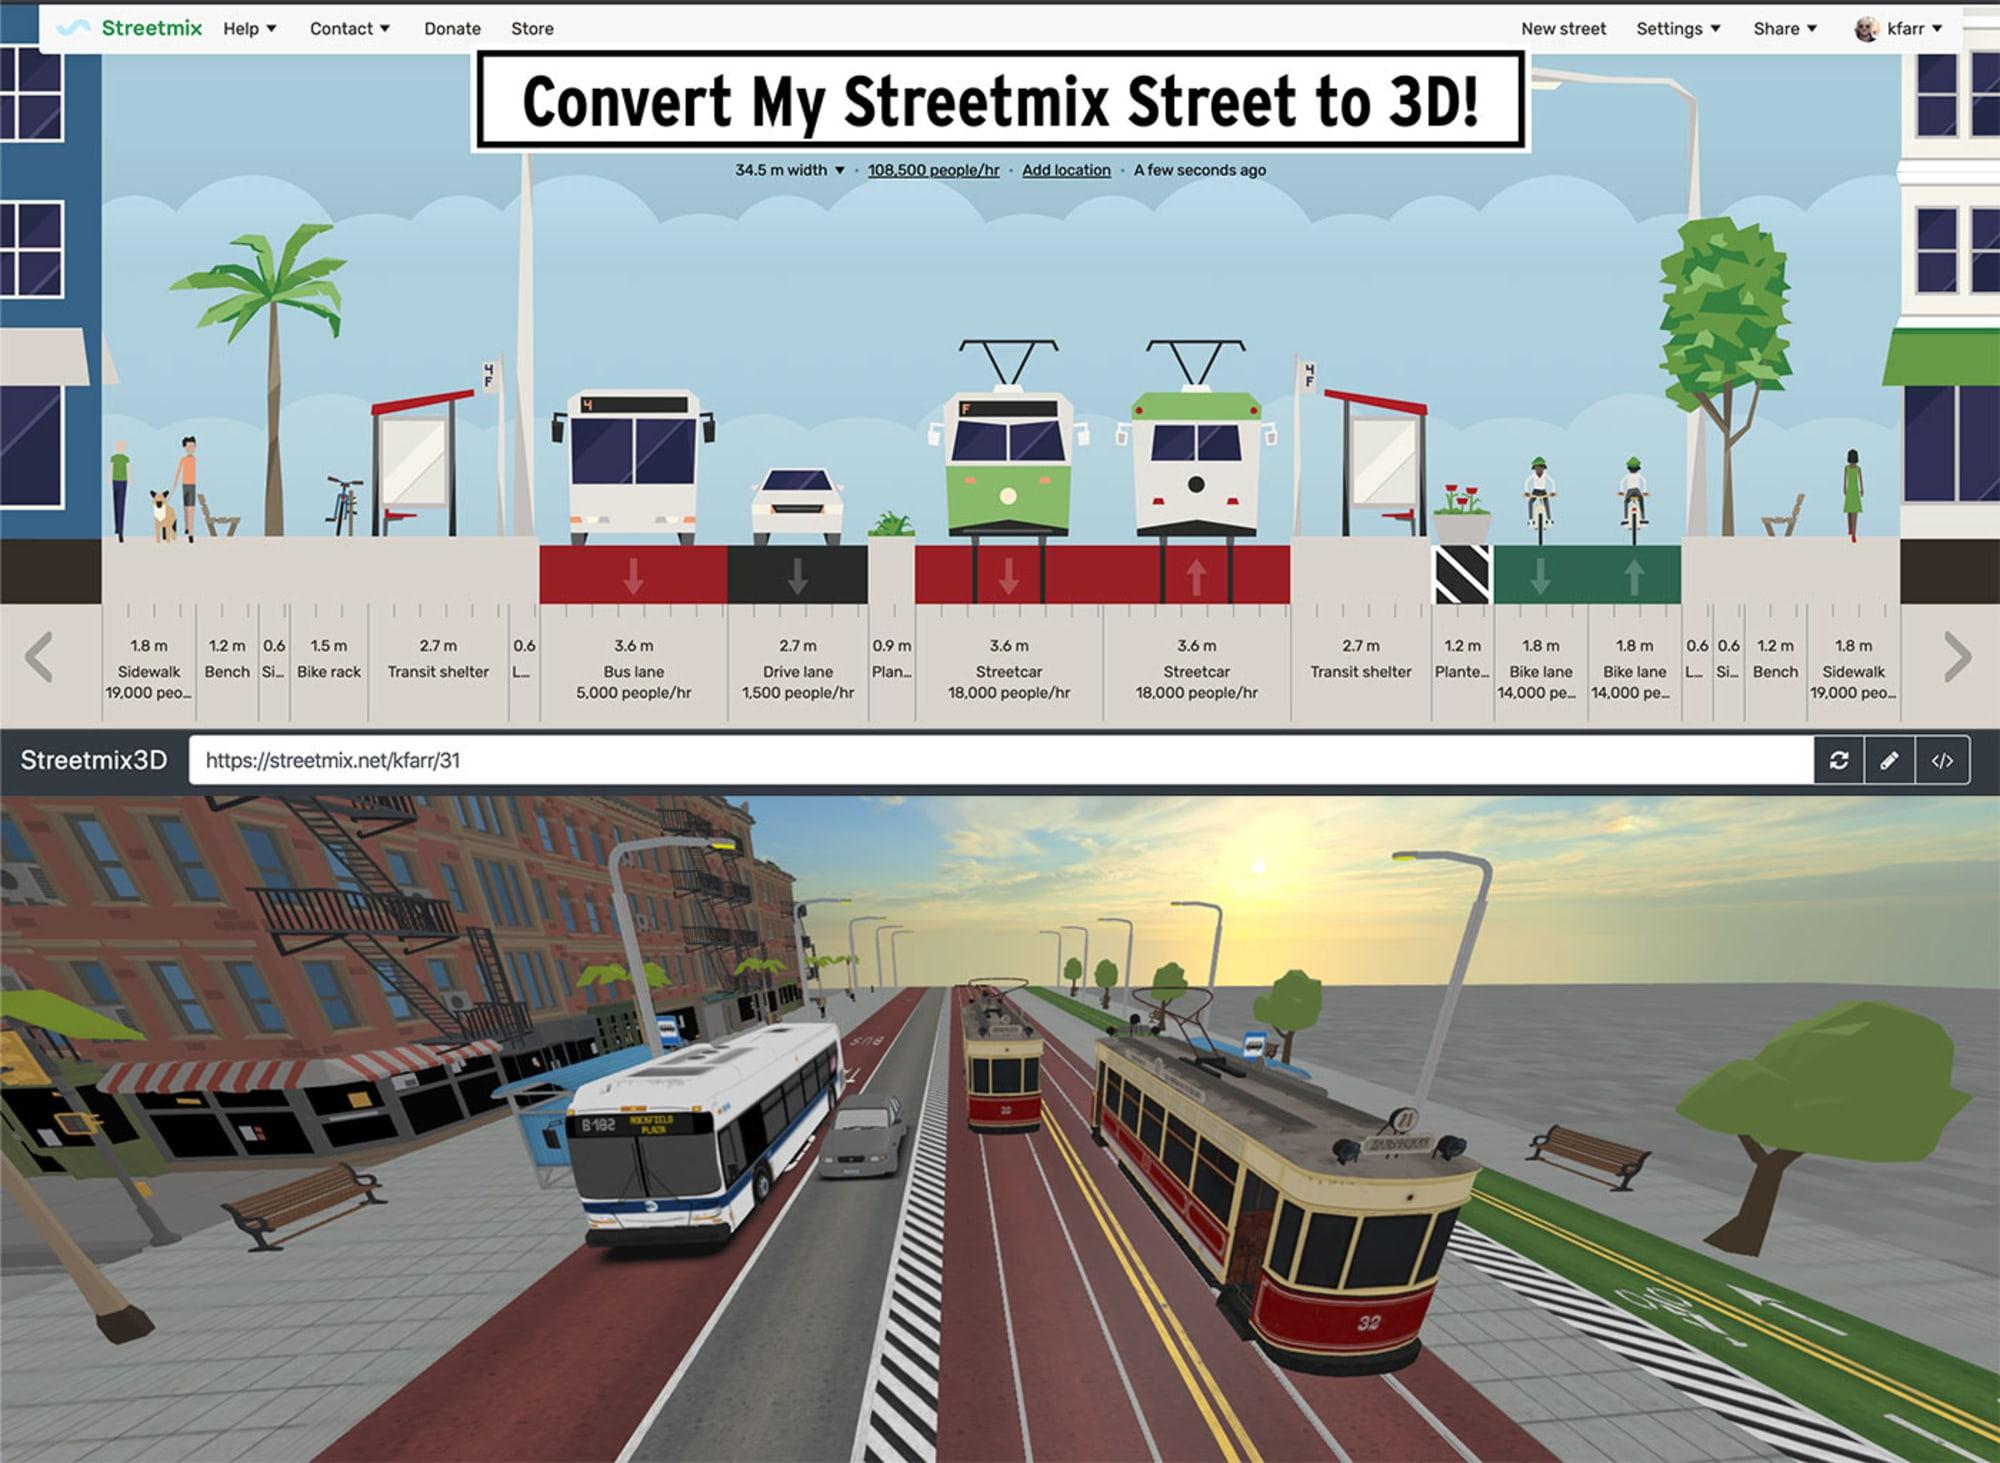 3D Streetmix visualisations